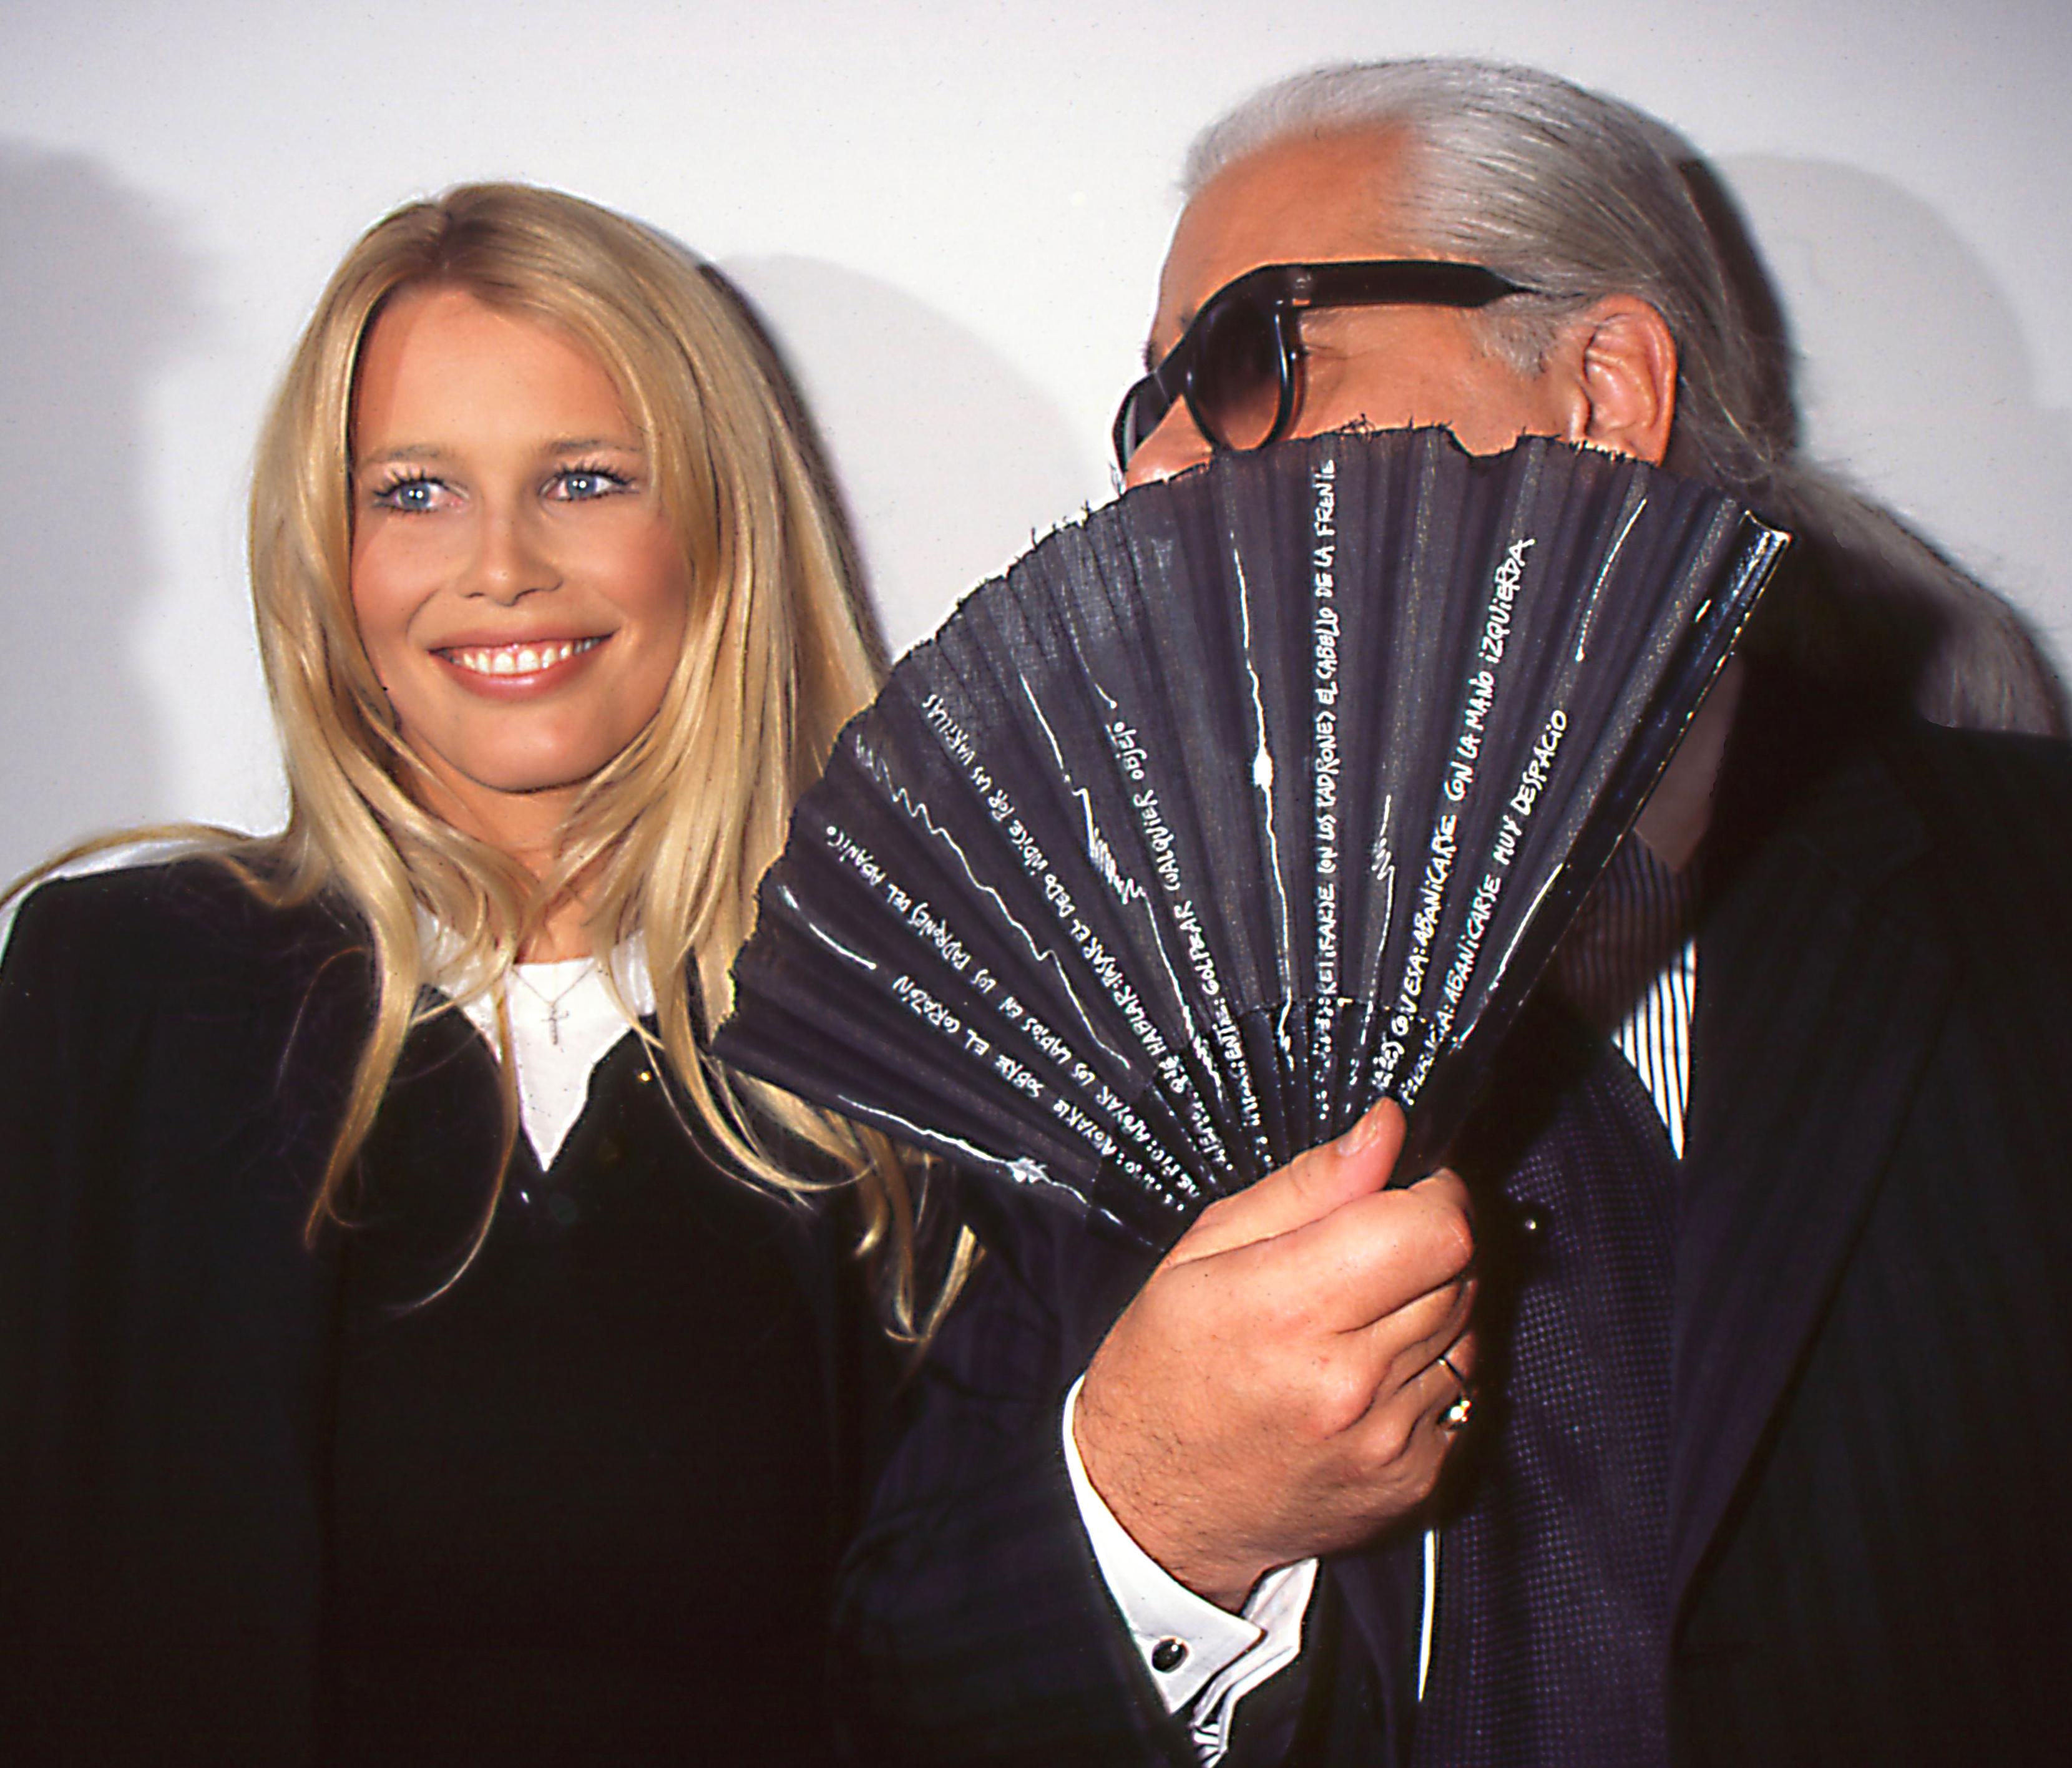 Claudia Schiffer & Karl Lagerfeld